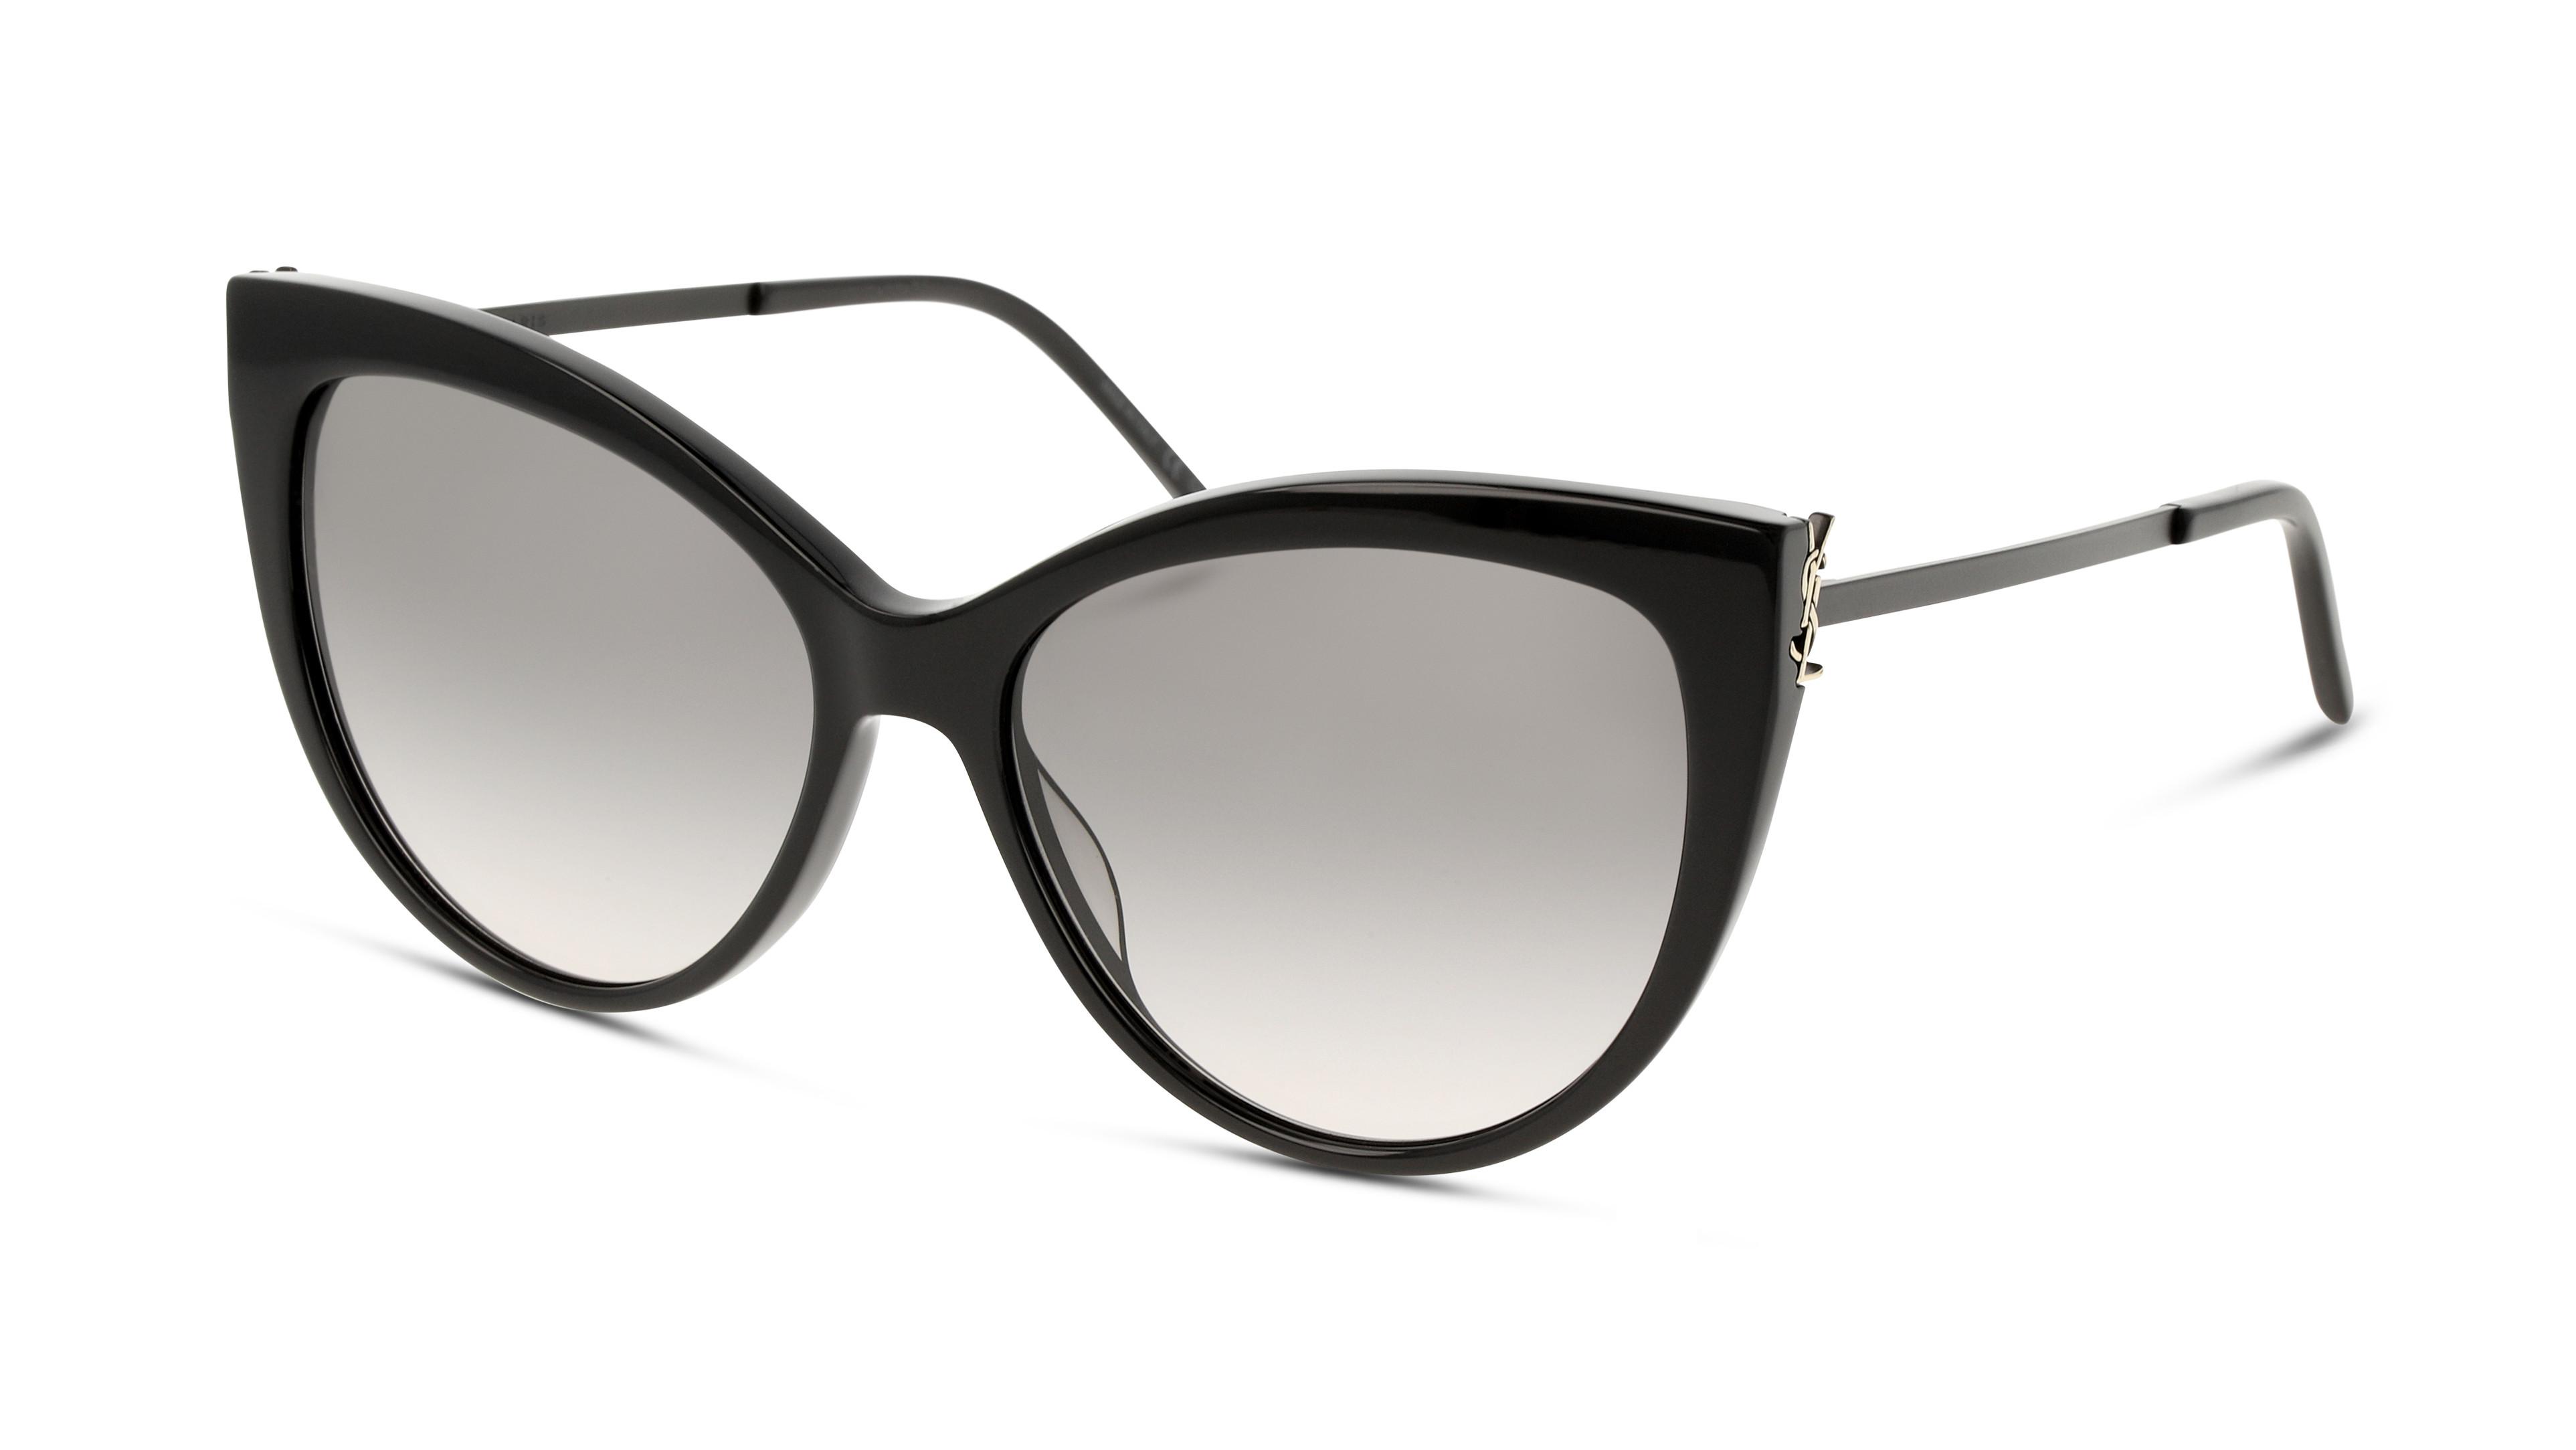 8056376273236-angle-03-saint-laurent-sl_m48s_a-eyewear-black-black-smoke